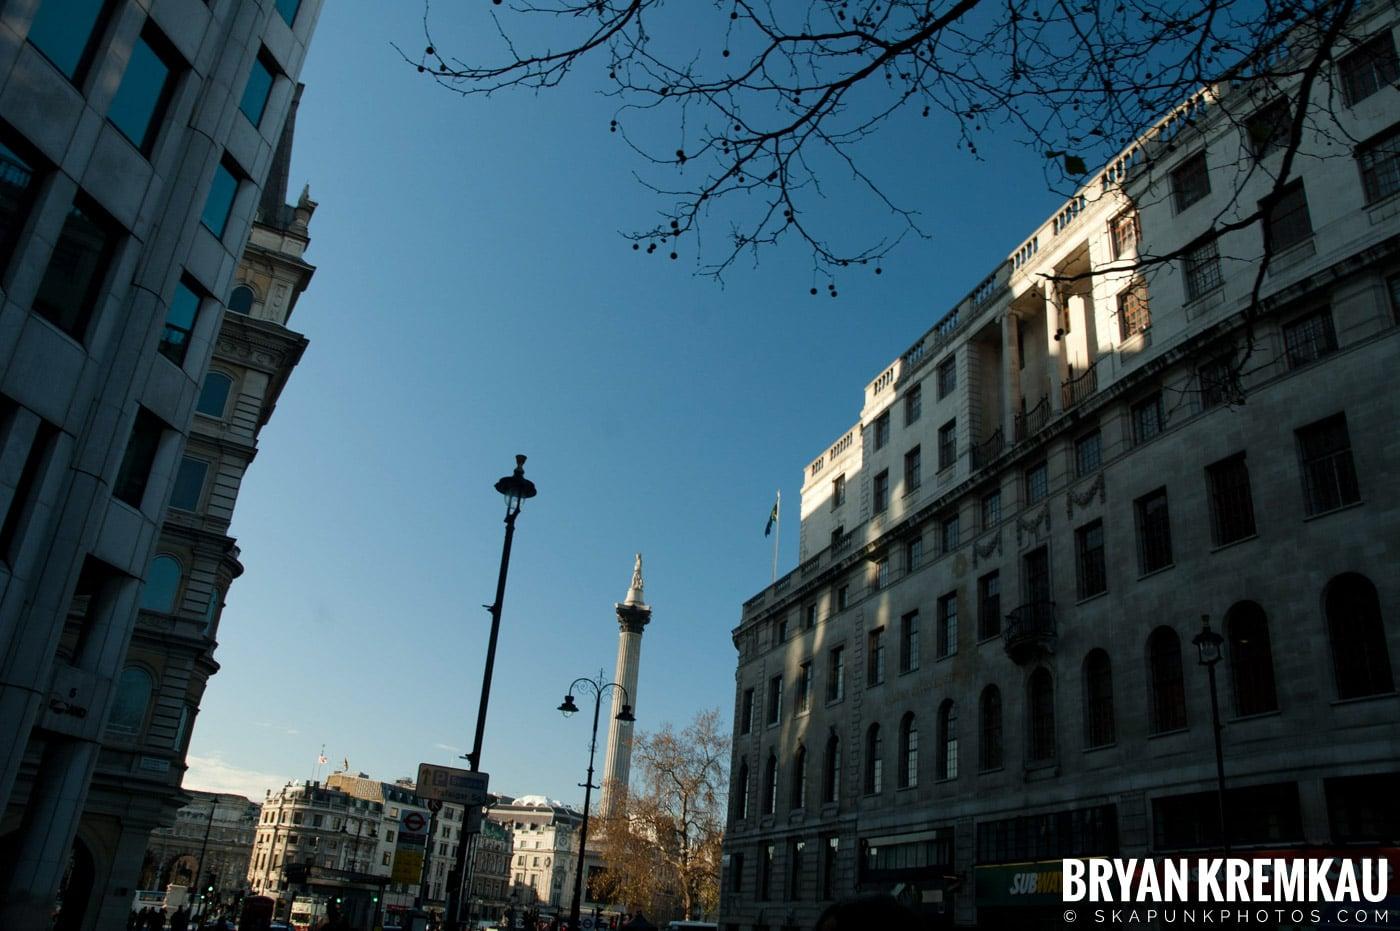 London, England - Day 5 - 12.17.06 (22)